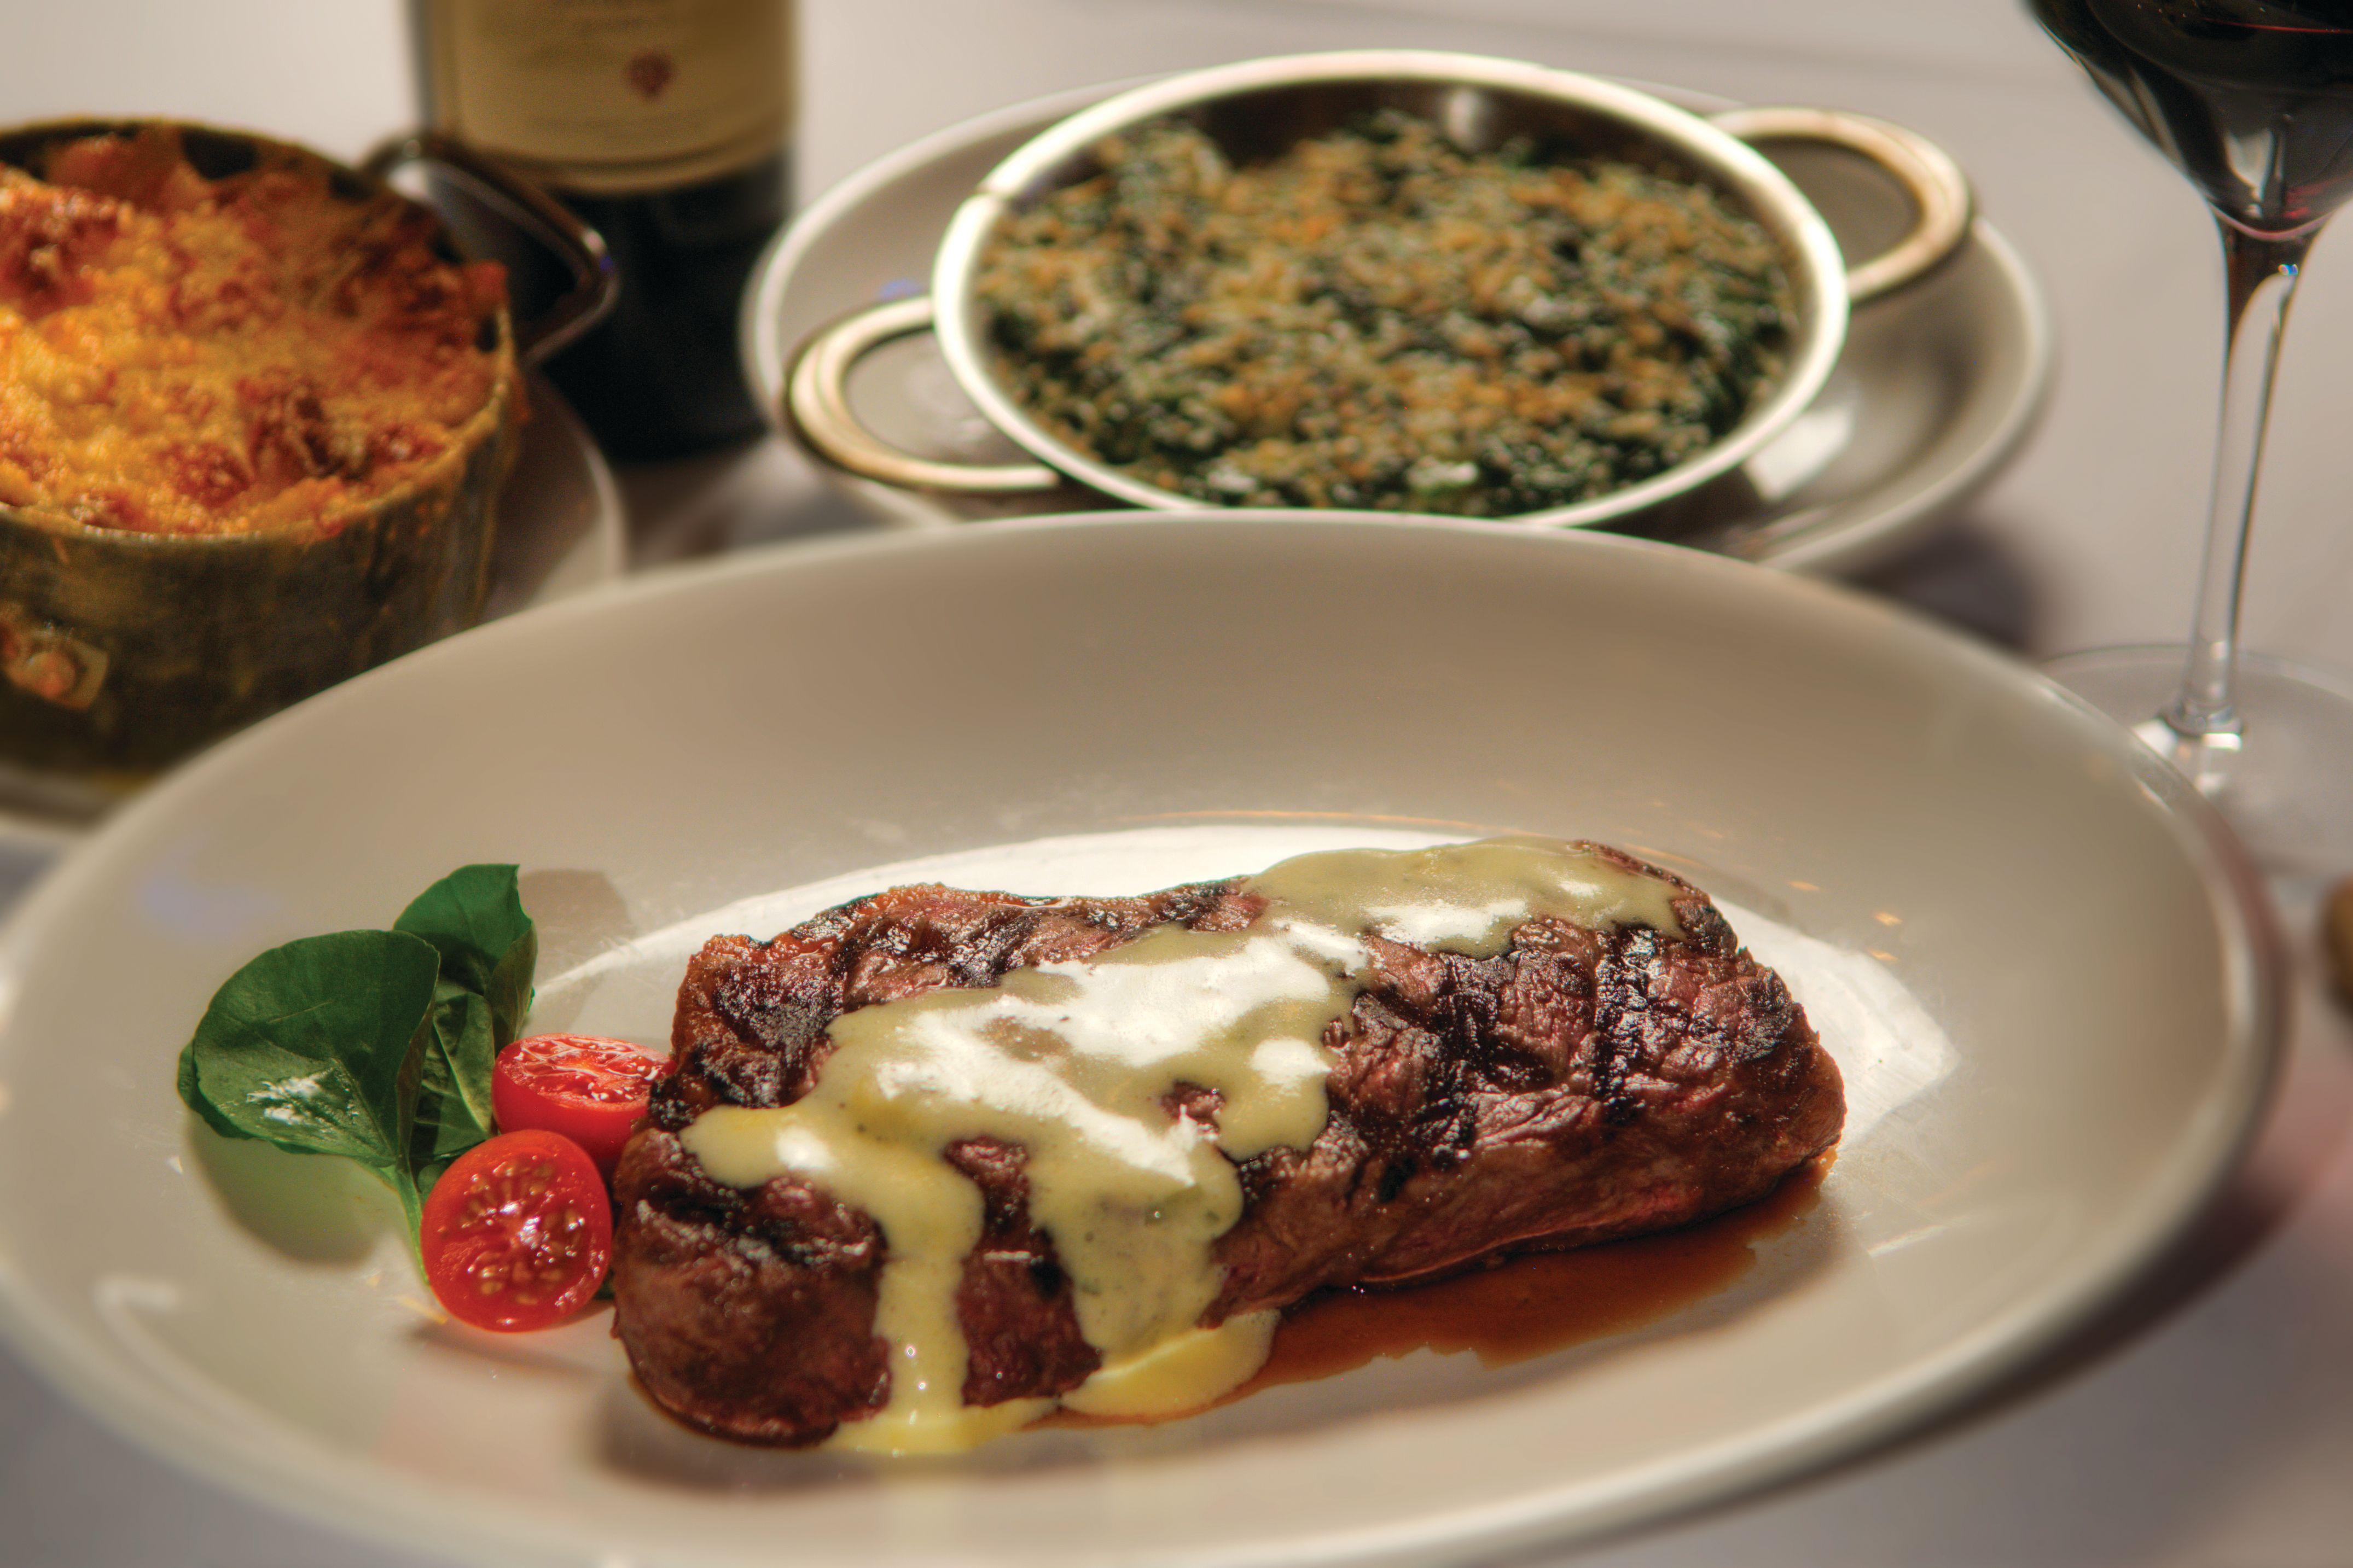 Cosu winter 2010 dining briar rose steak kwkdx1